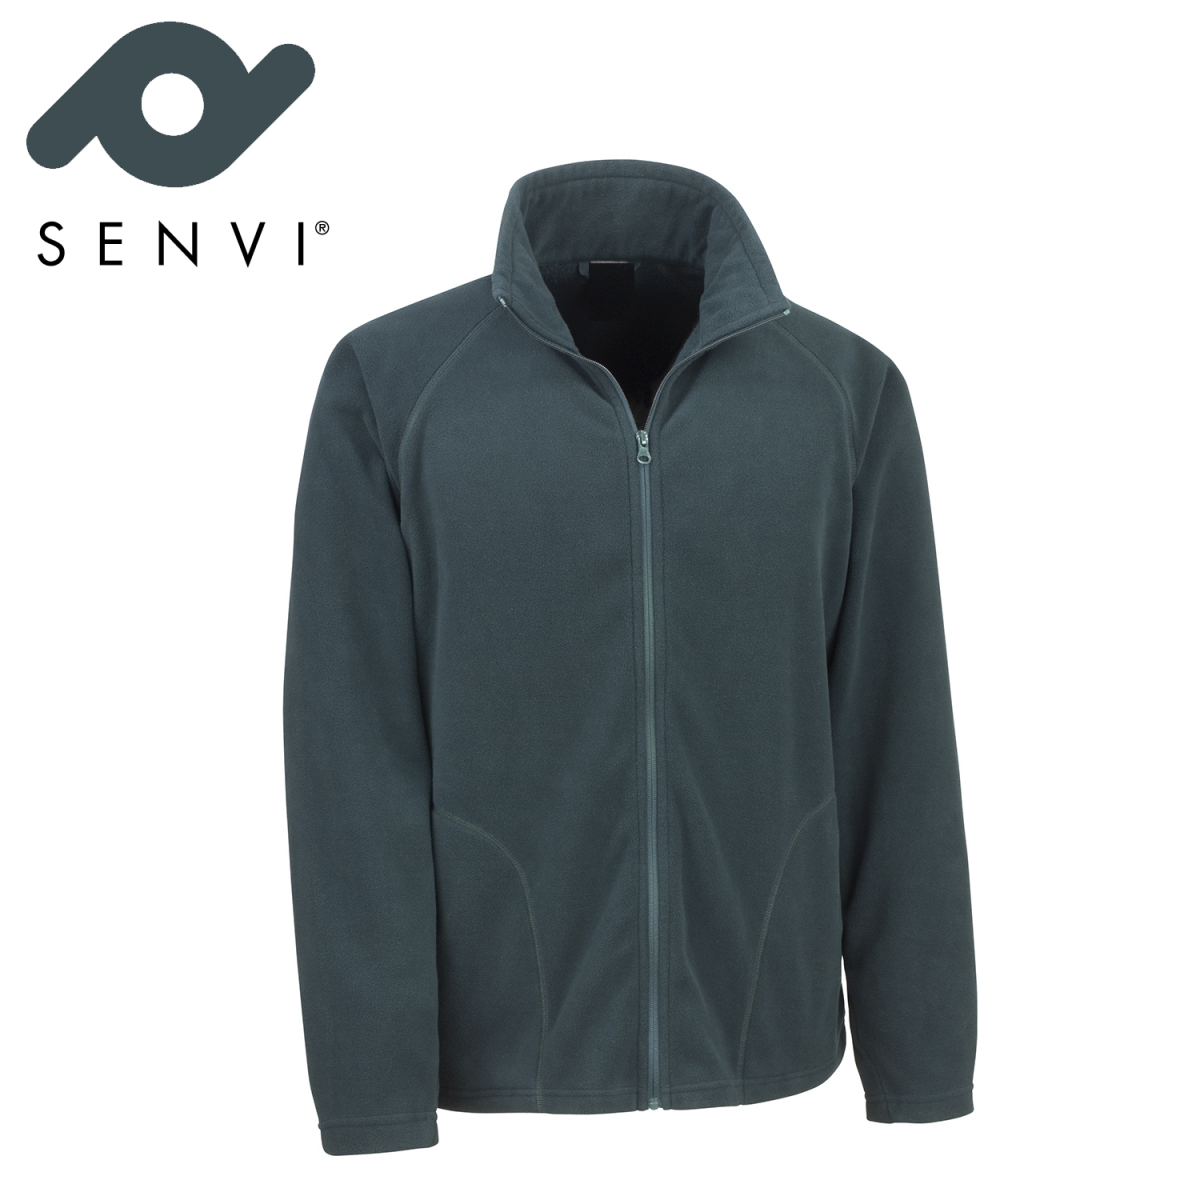 Senvi Basic Fleece Vest - Thermisch laag microfleece - Kleur Dennengroen - Maat XXXL